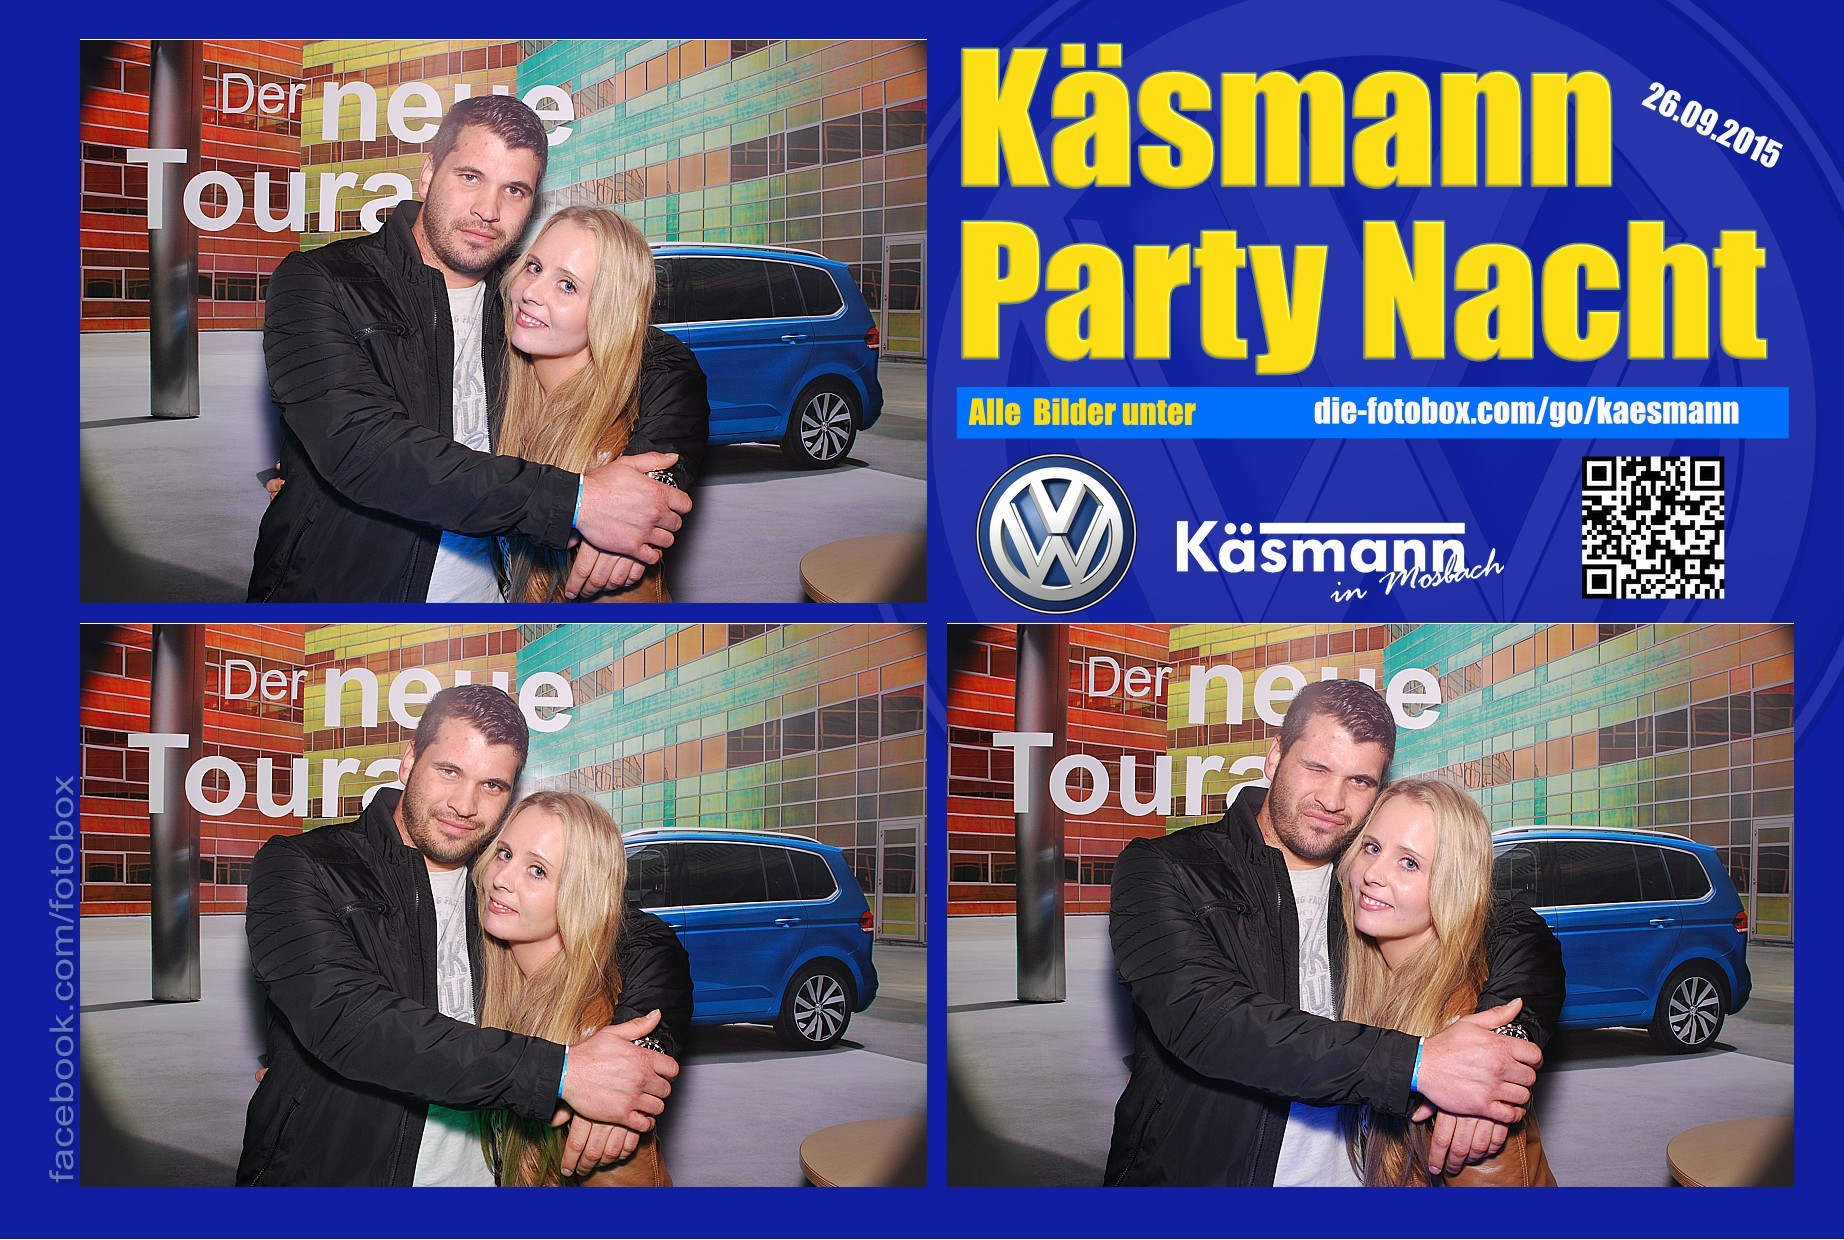 Käsmannparty 2015 - www.die-fotobox.com 01245